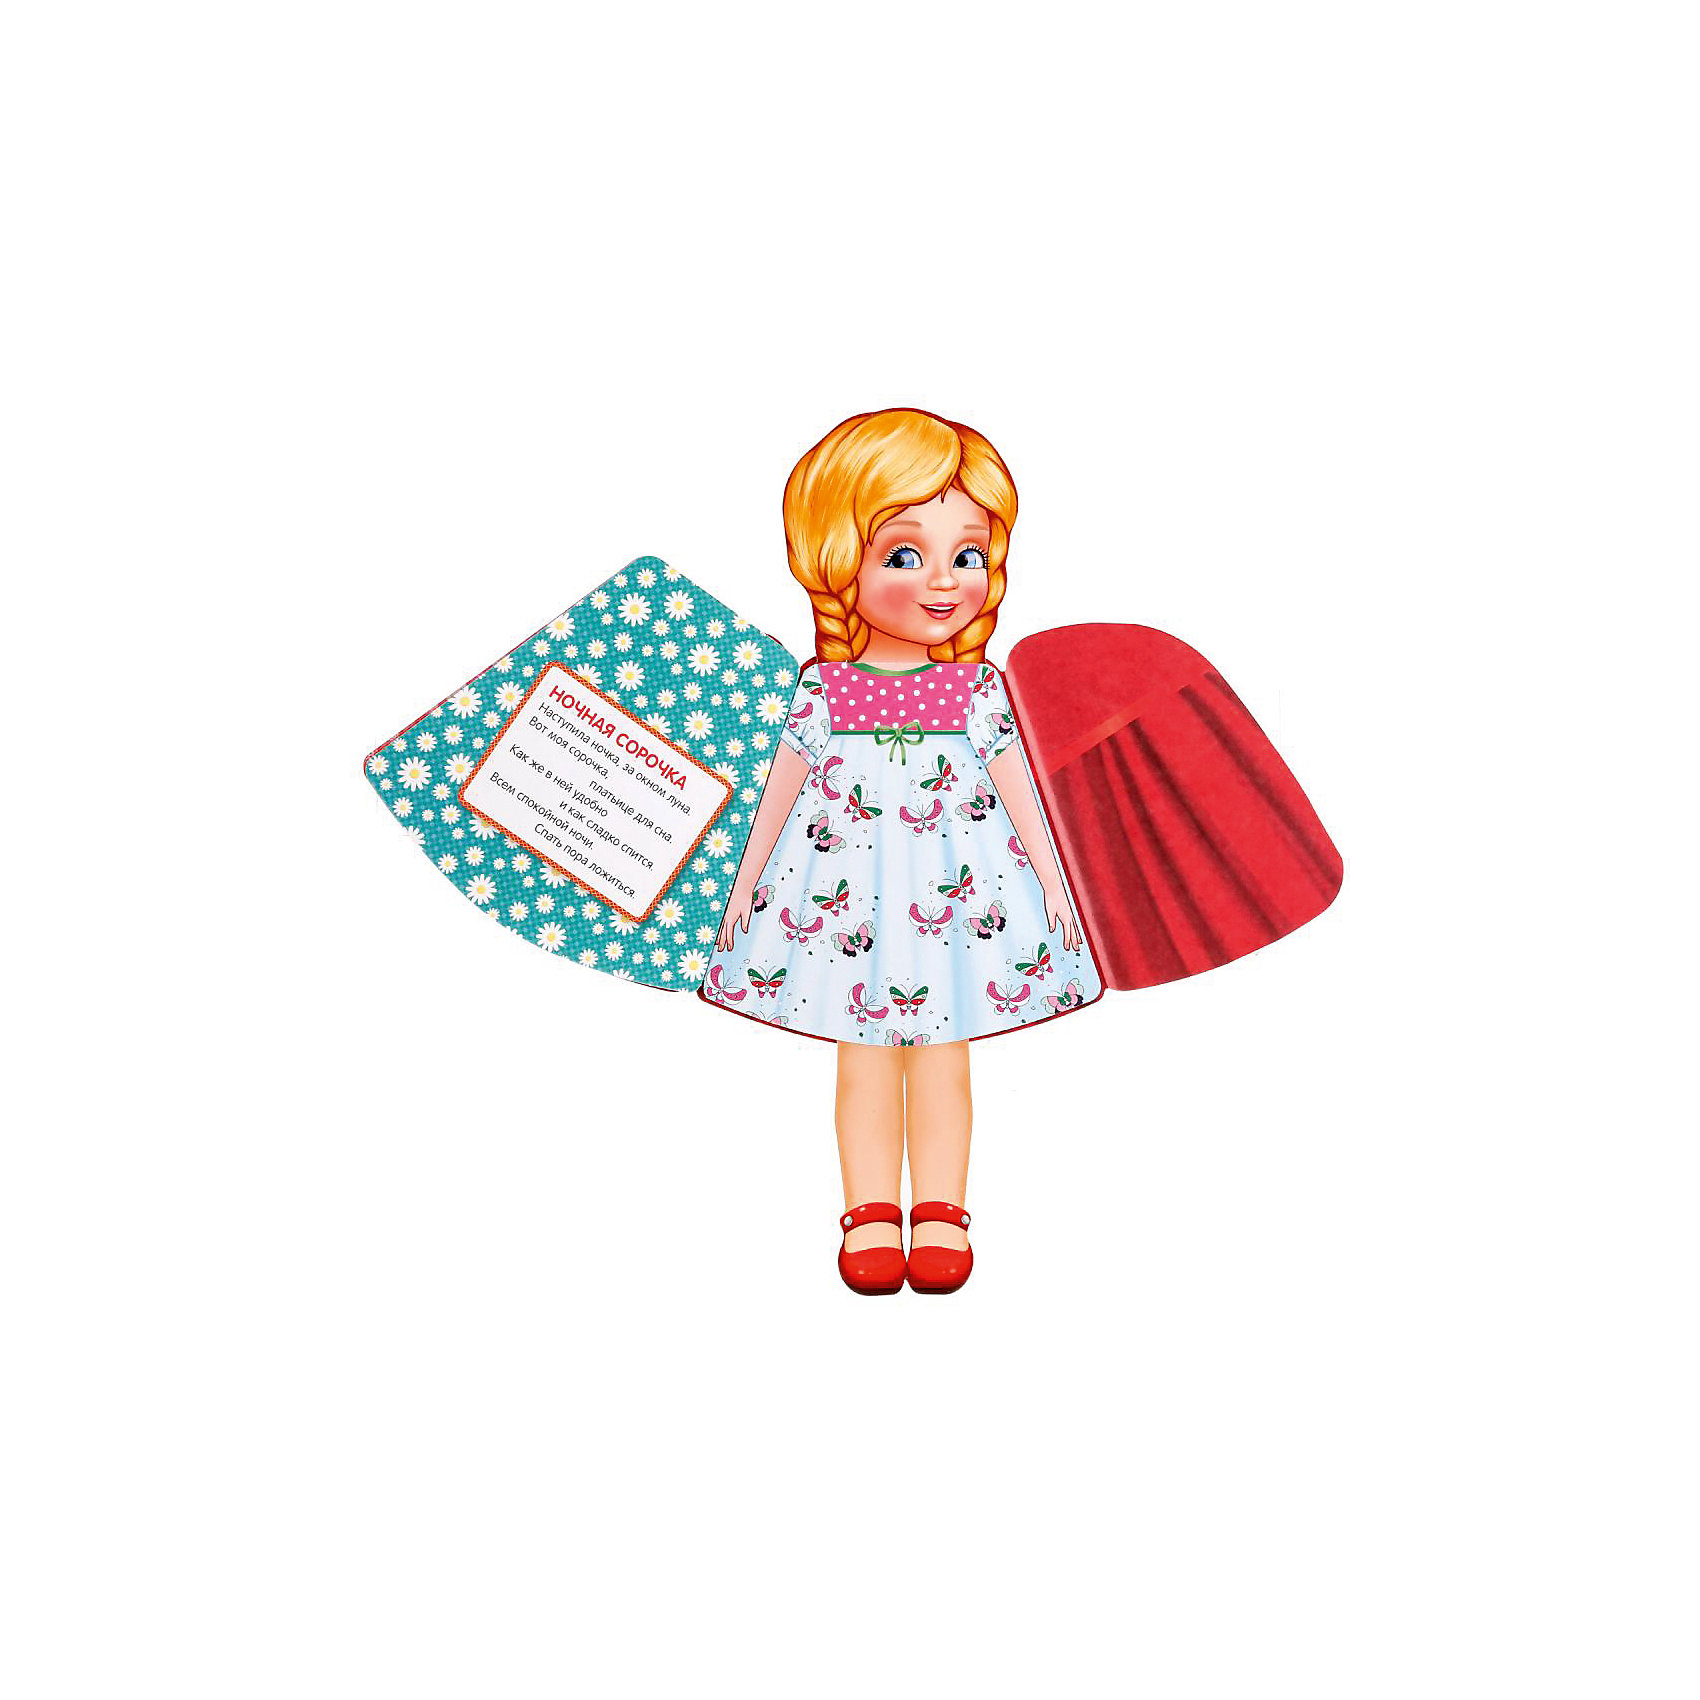 моя любимая кукла картинки зря